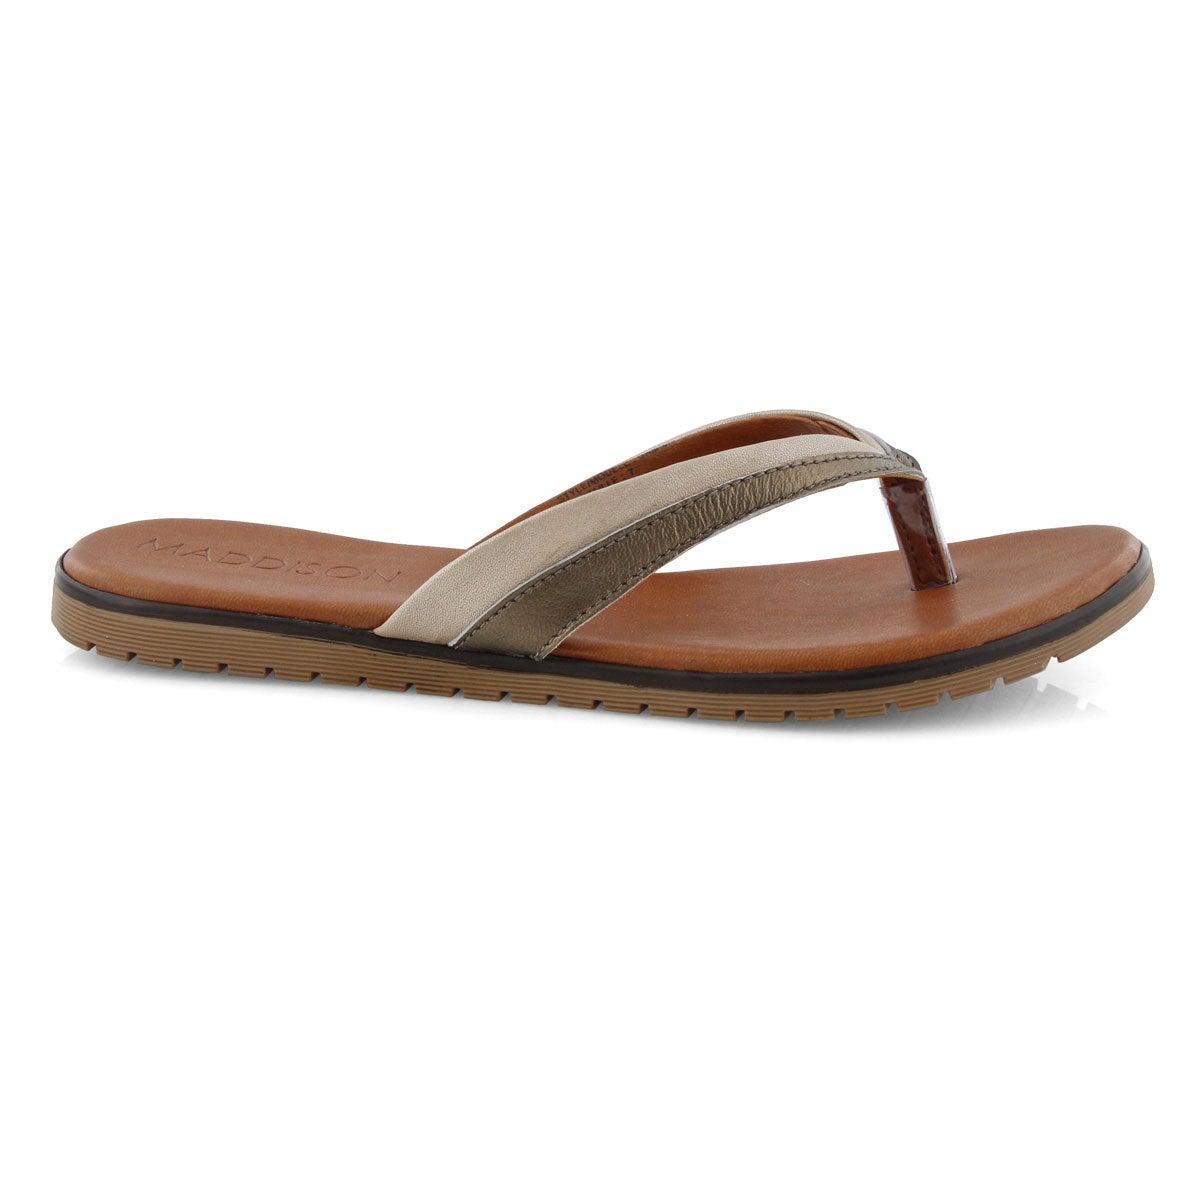 Lds Gamila pewter/champagne thong sandal